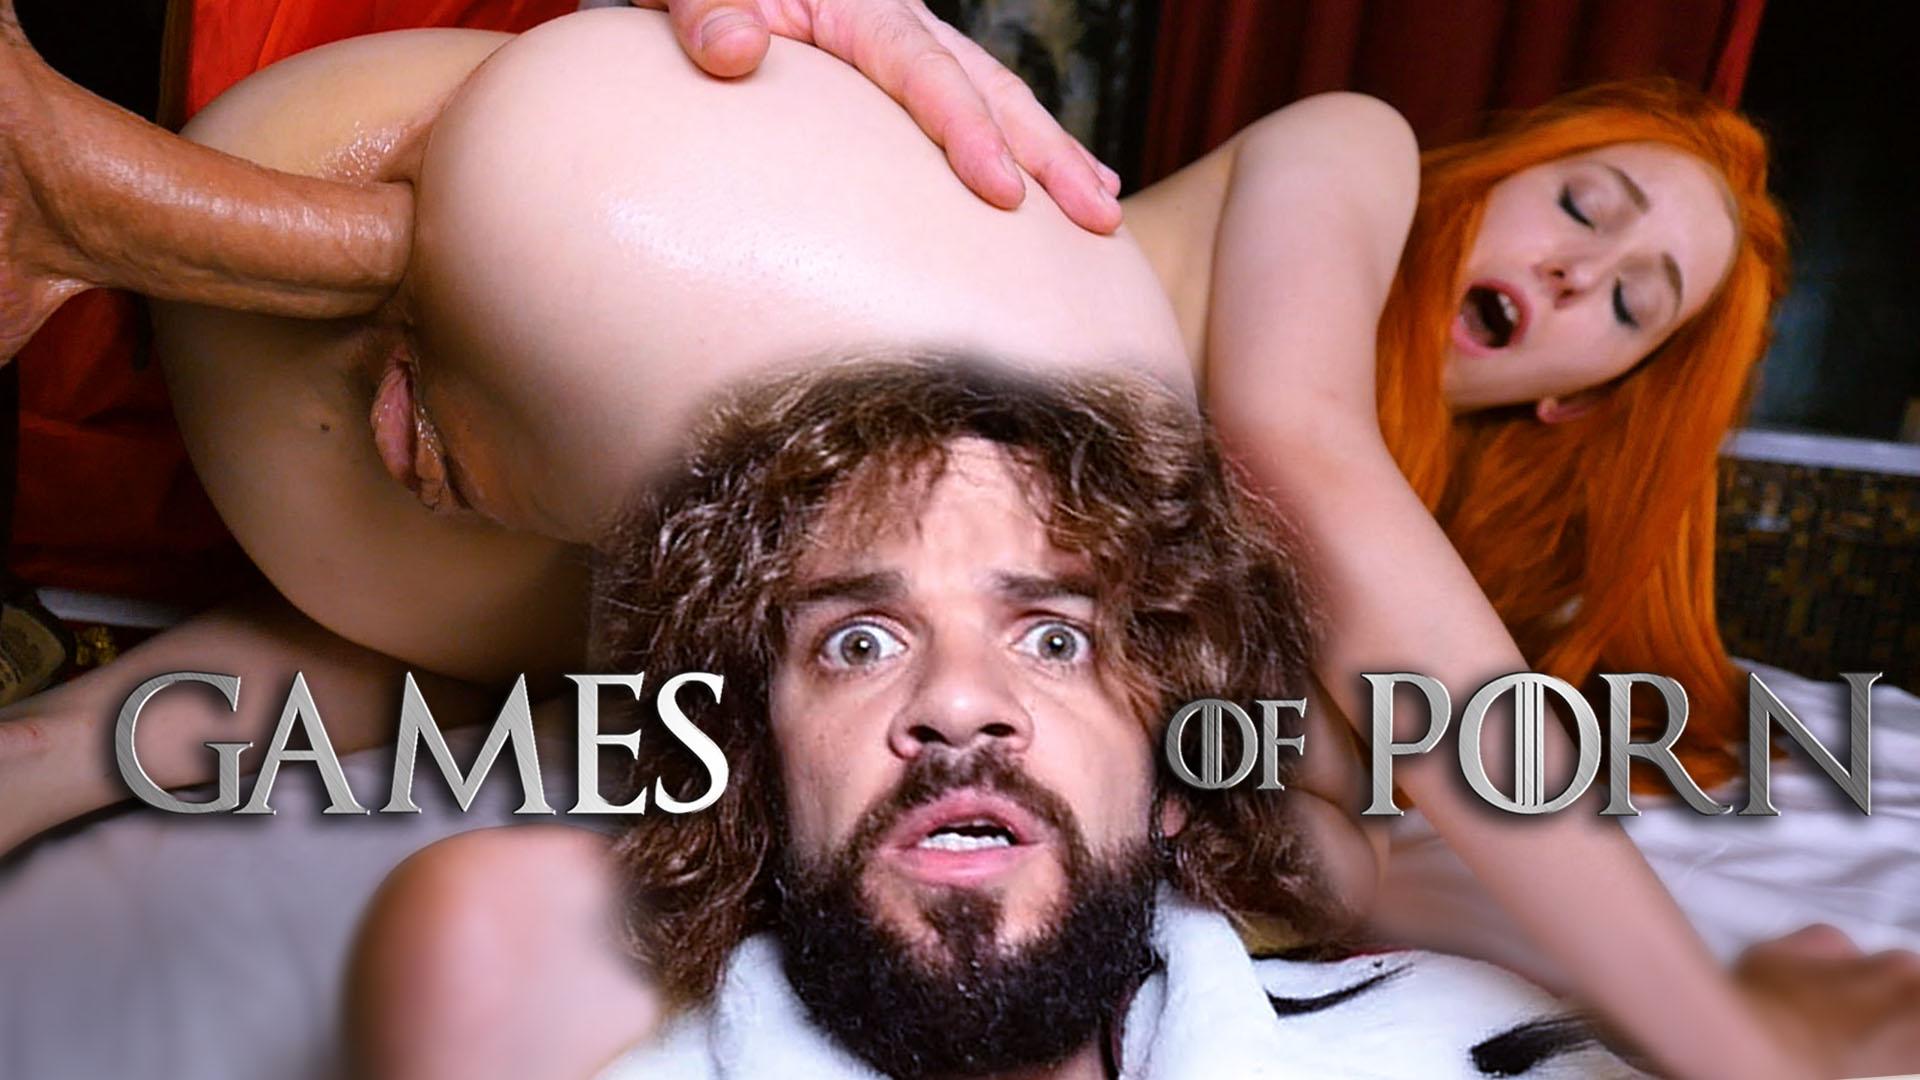 Game of Porn Episode 4: Sansa's Honeymoon - SWEETYX